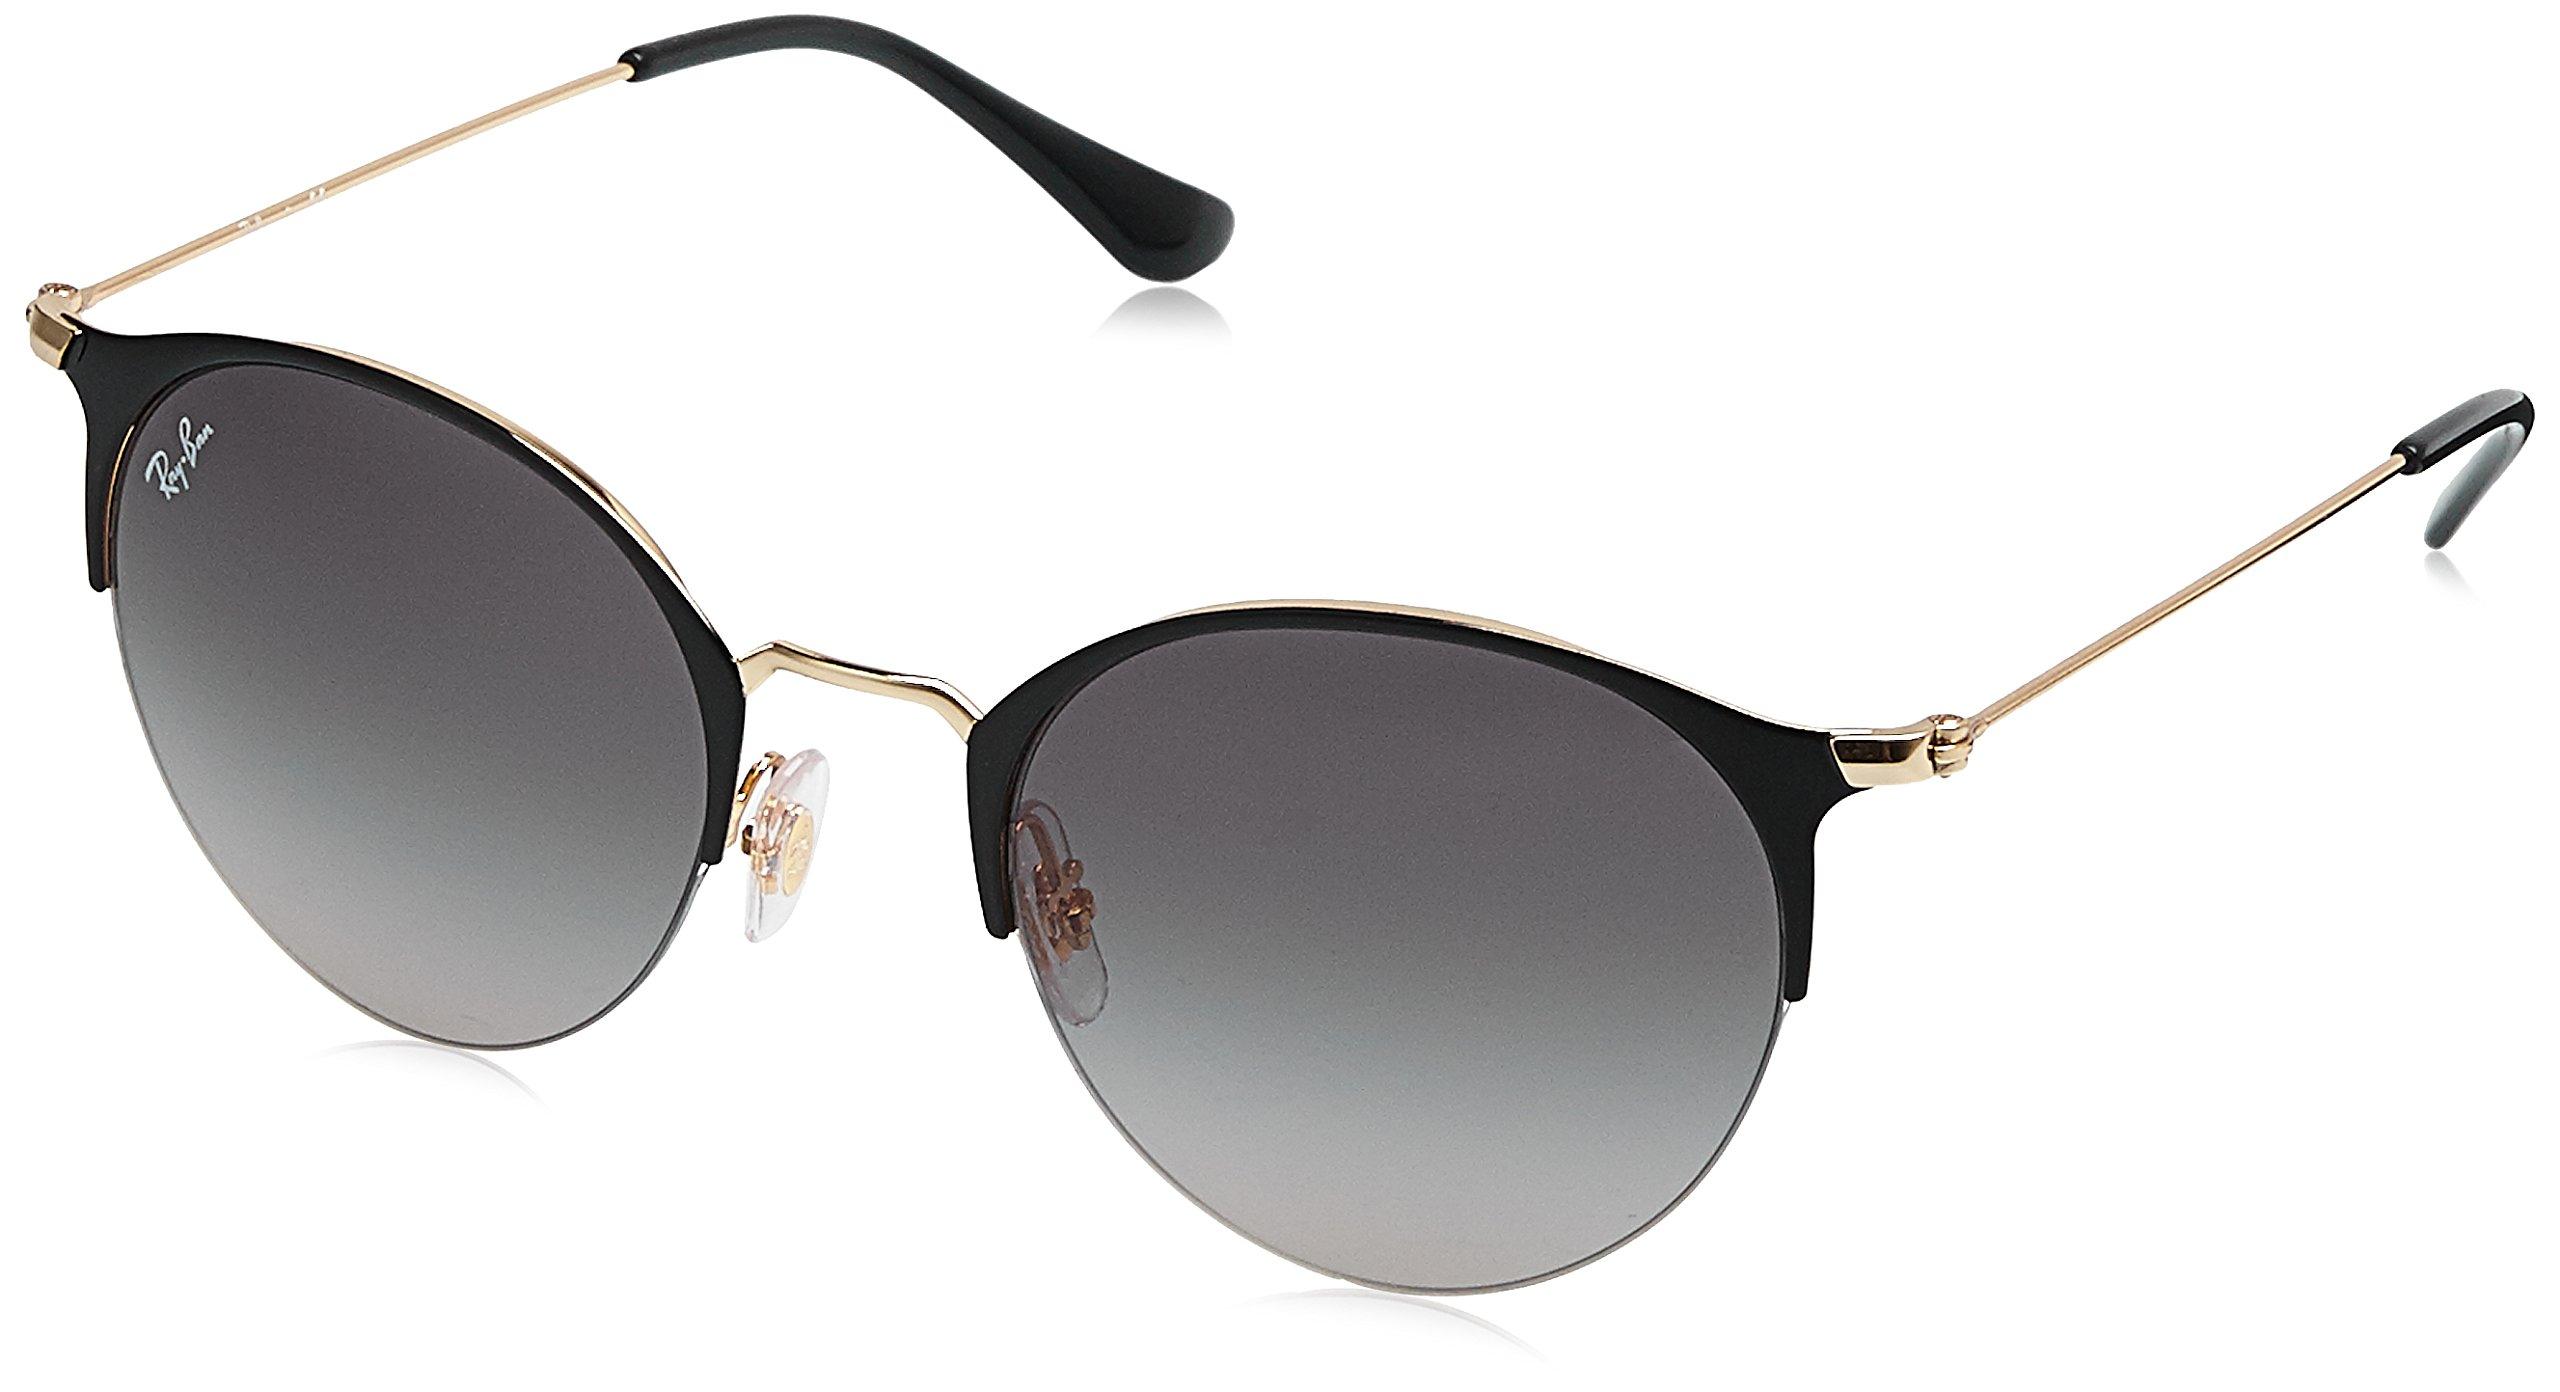 Ray-Ban Metal Unisex Round Sunglasses, Gold Top Shiny Black, 50 mm